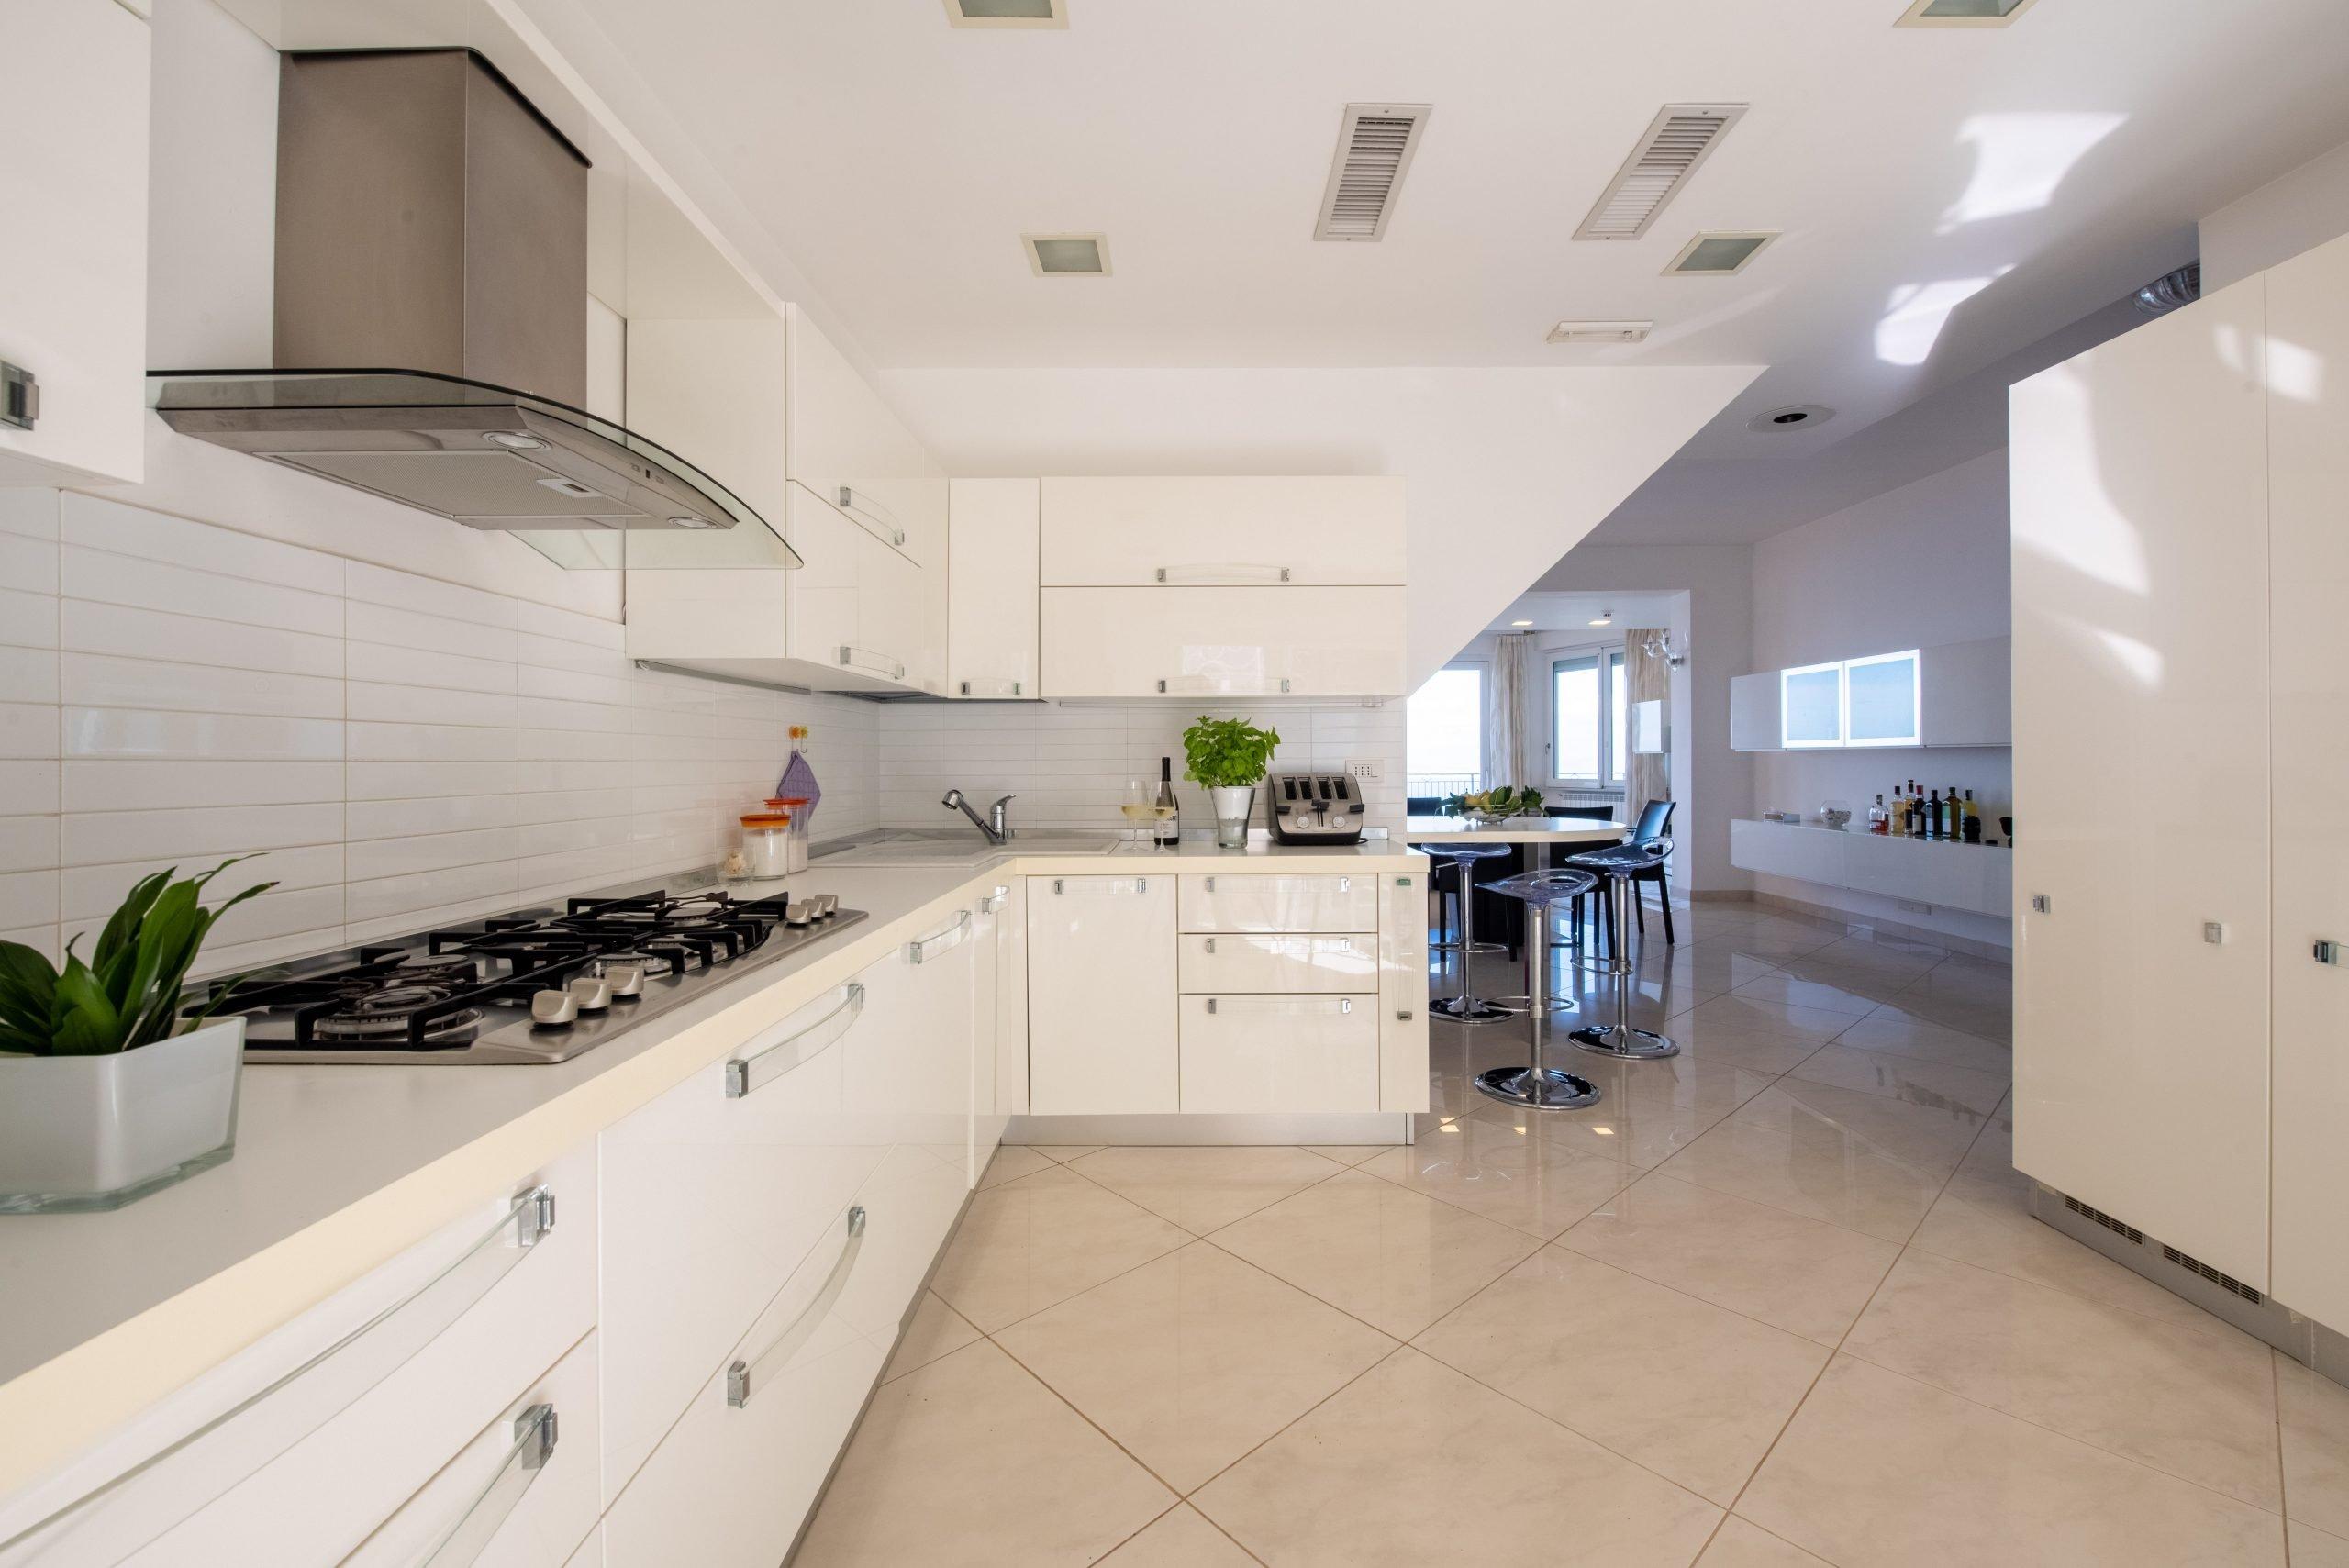 Villa Acampora Sorrento Interiors